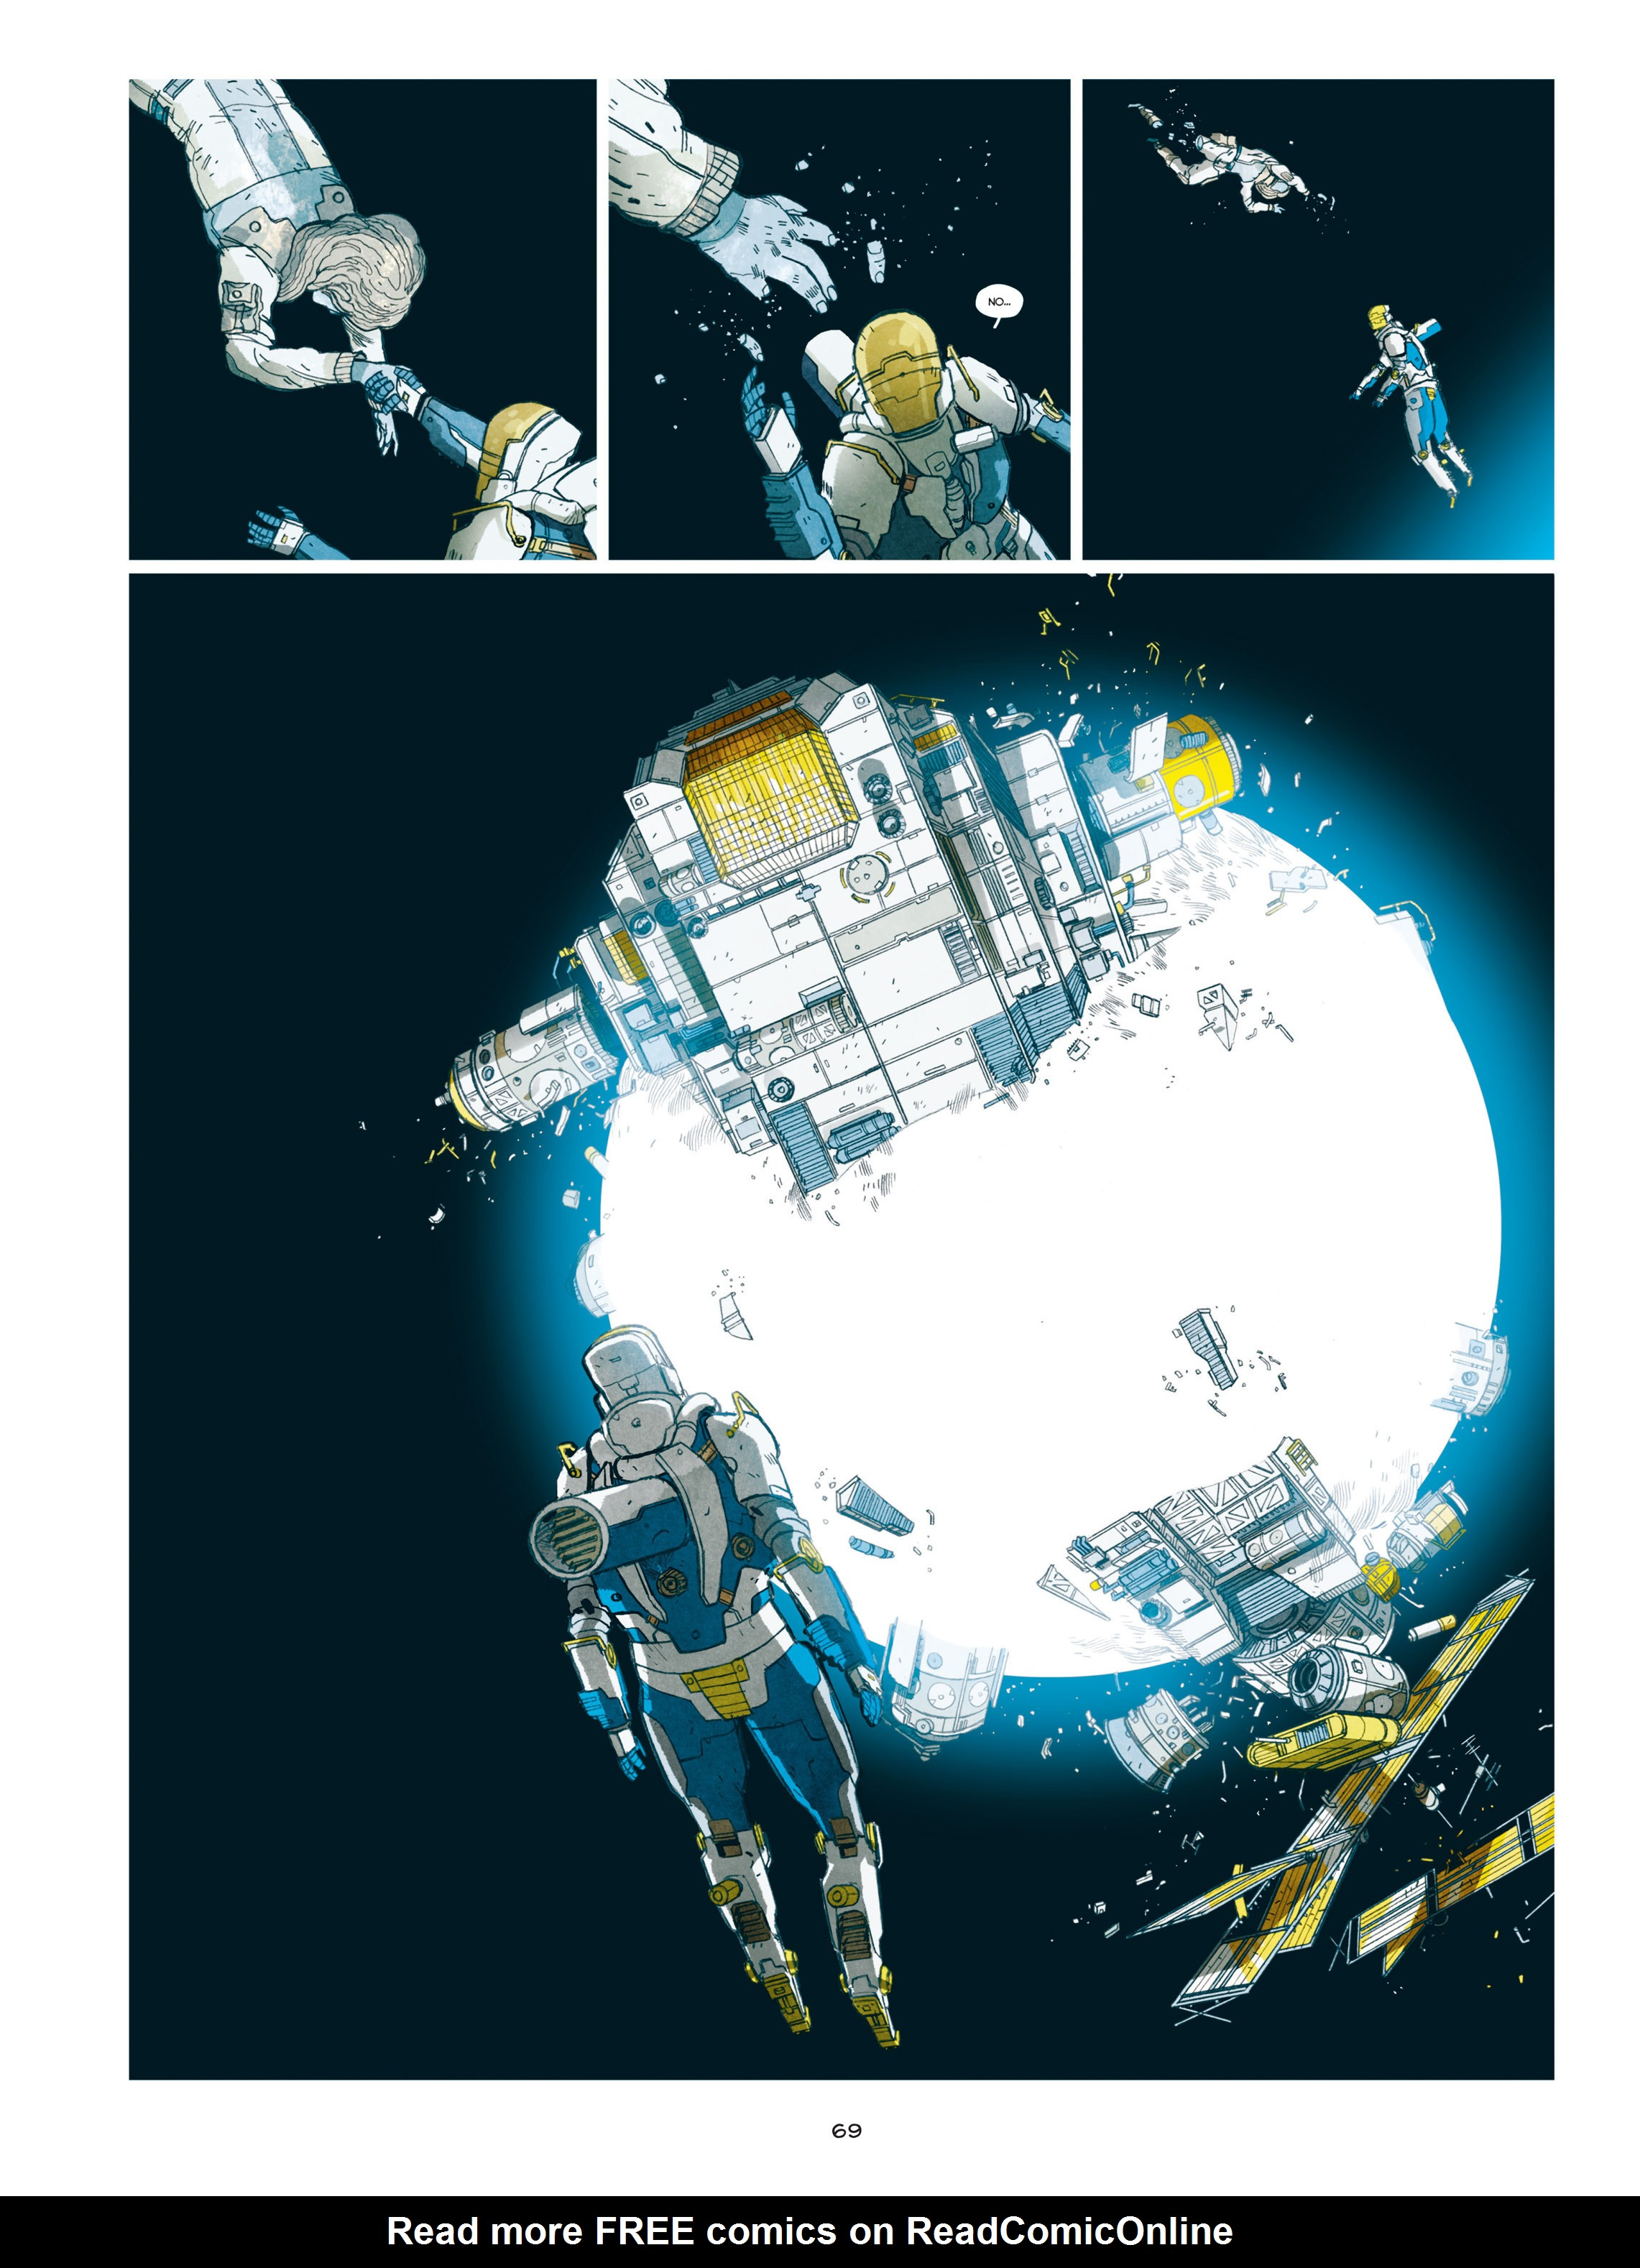 Read online Shangri-La comic -  Issue # Full - 70